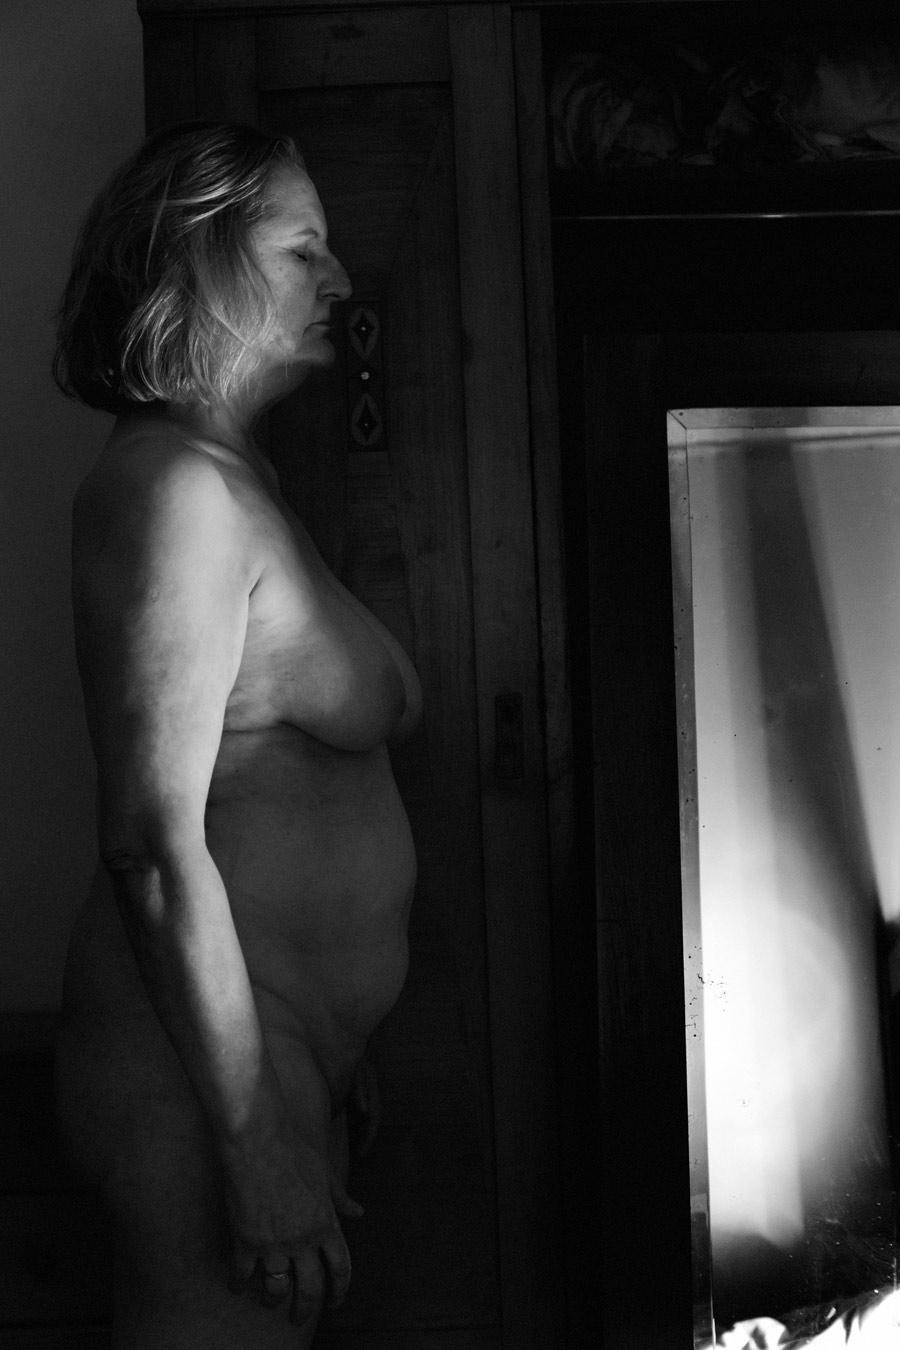 Kundalini, Fotoserie von Antje Kroeger